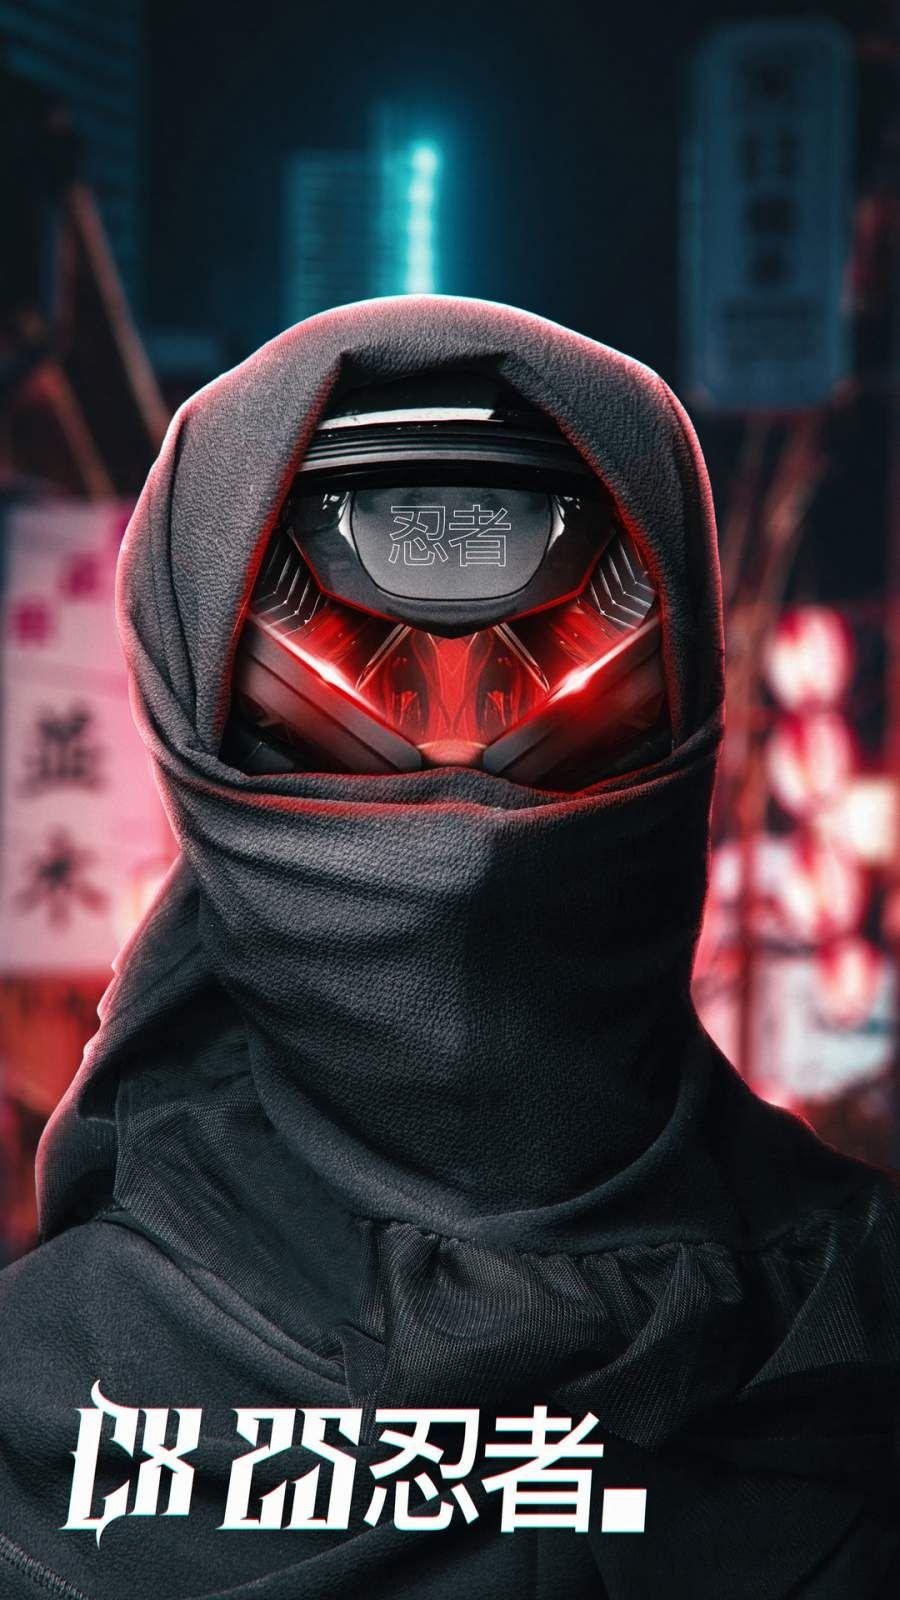 Scifi Ninja iPhone Wallpaper in 2020 Iphone wallpaper